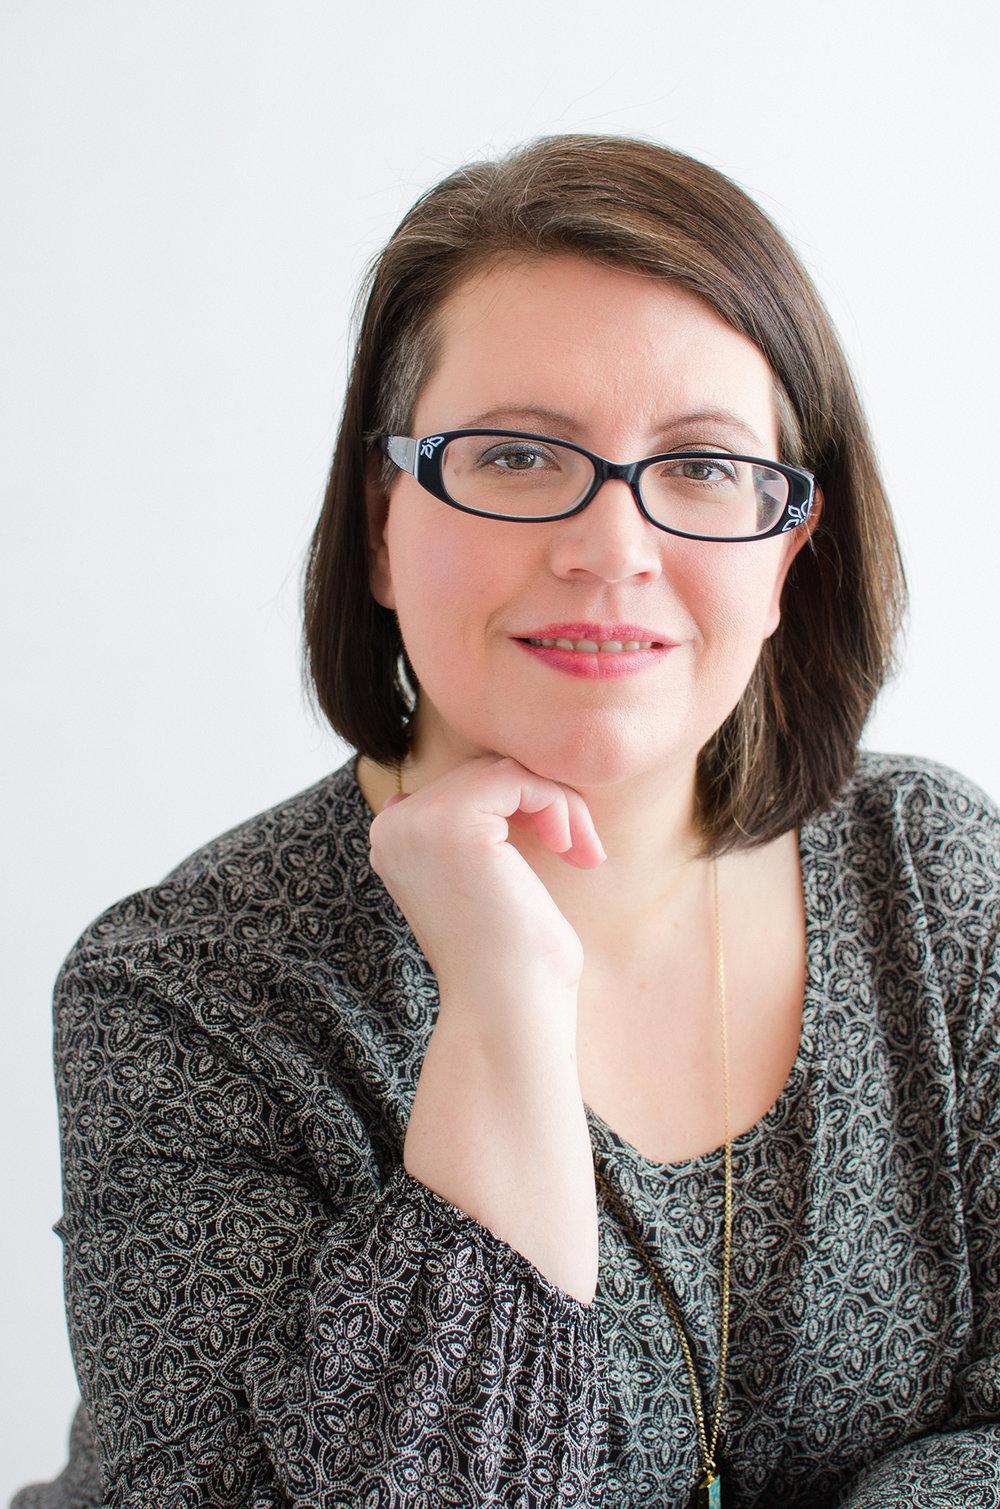 Kathy Rasmussen, Co-founder of Badassery Magazine